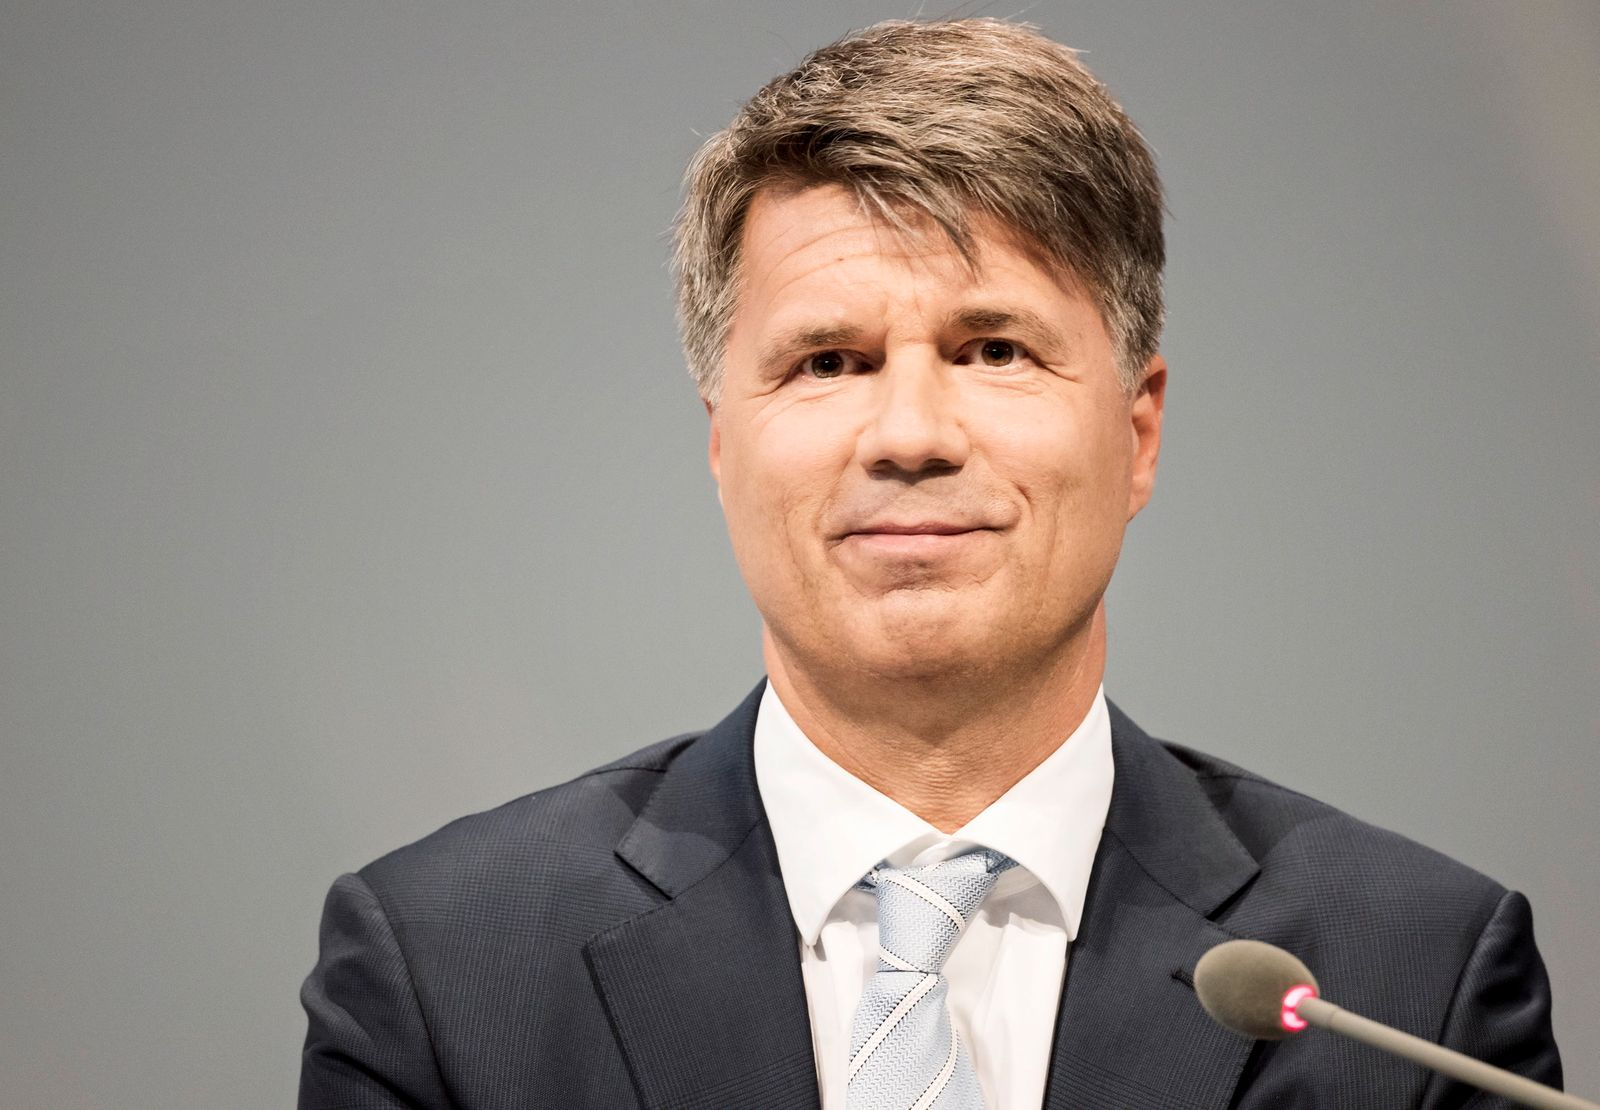 Harald Krüger / BMW Hauptversammlung Mai 2018